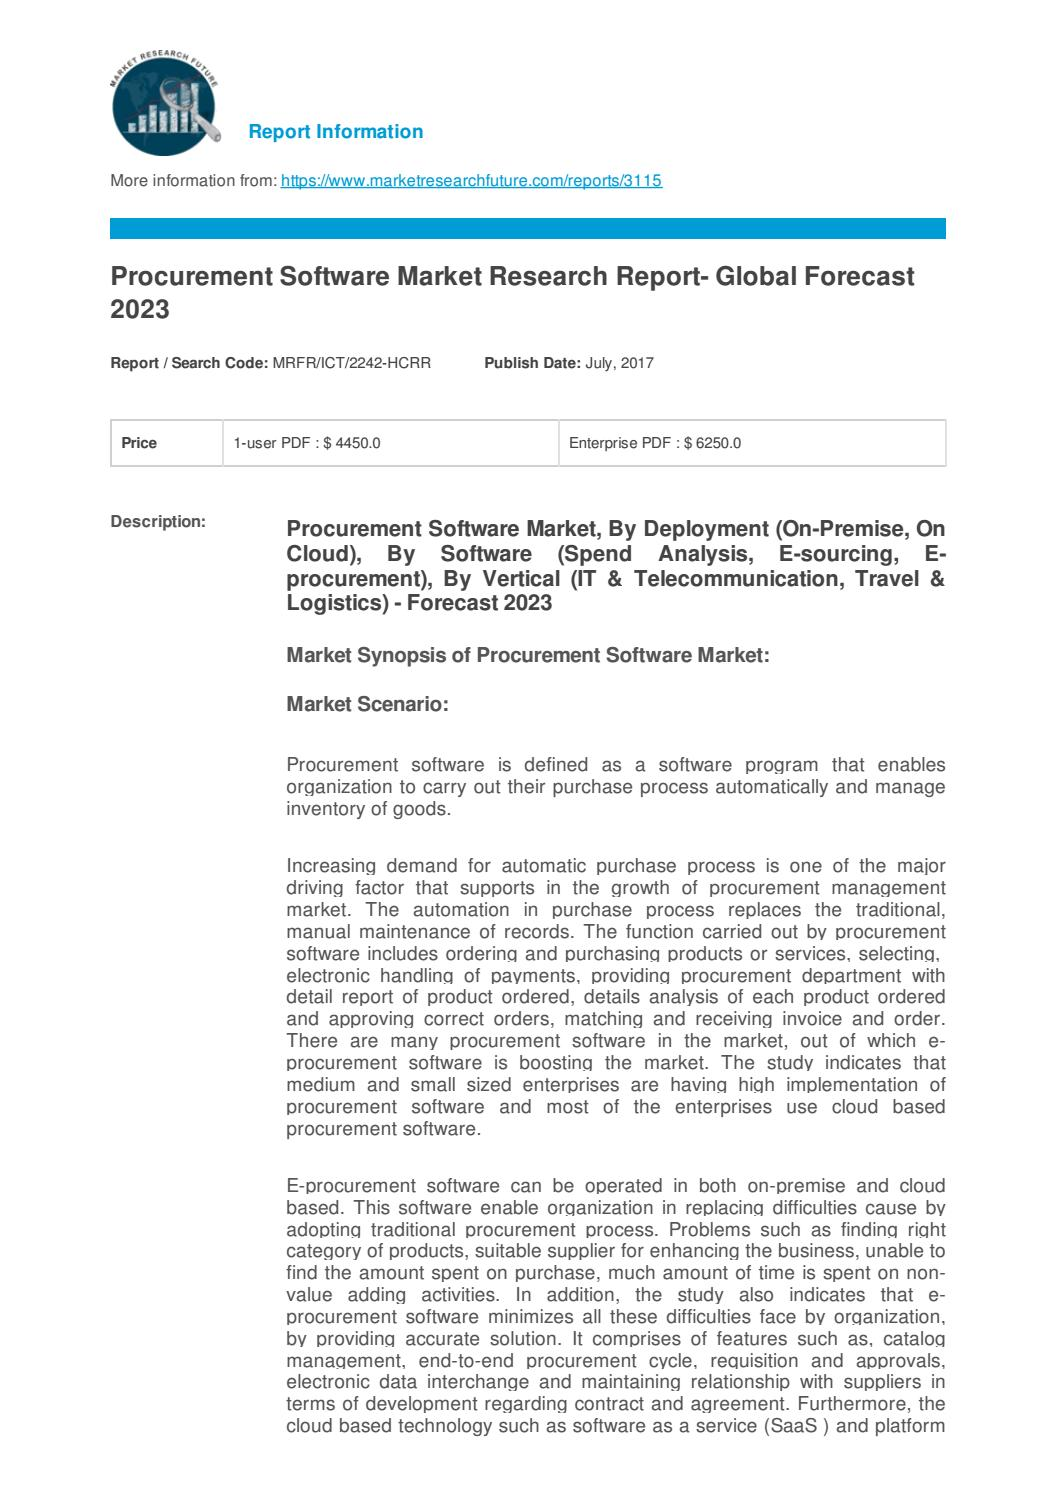 Global procurement software will reach usd 9 billion by 2023